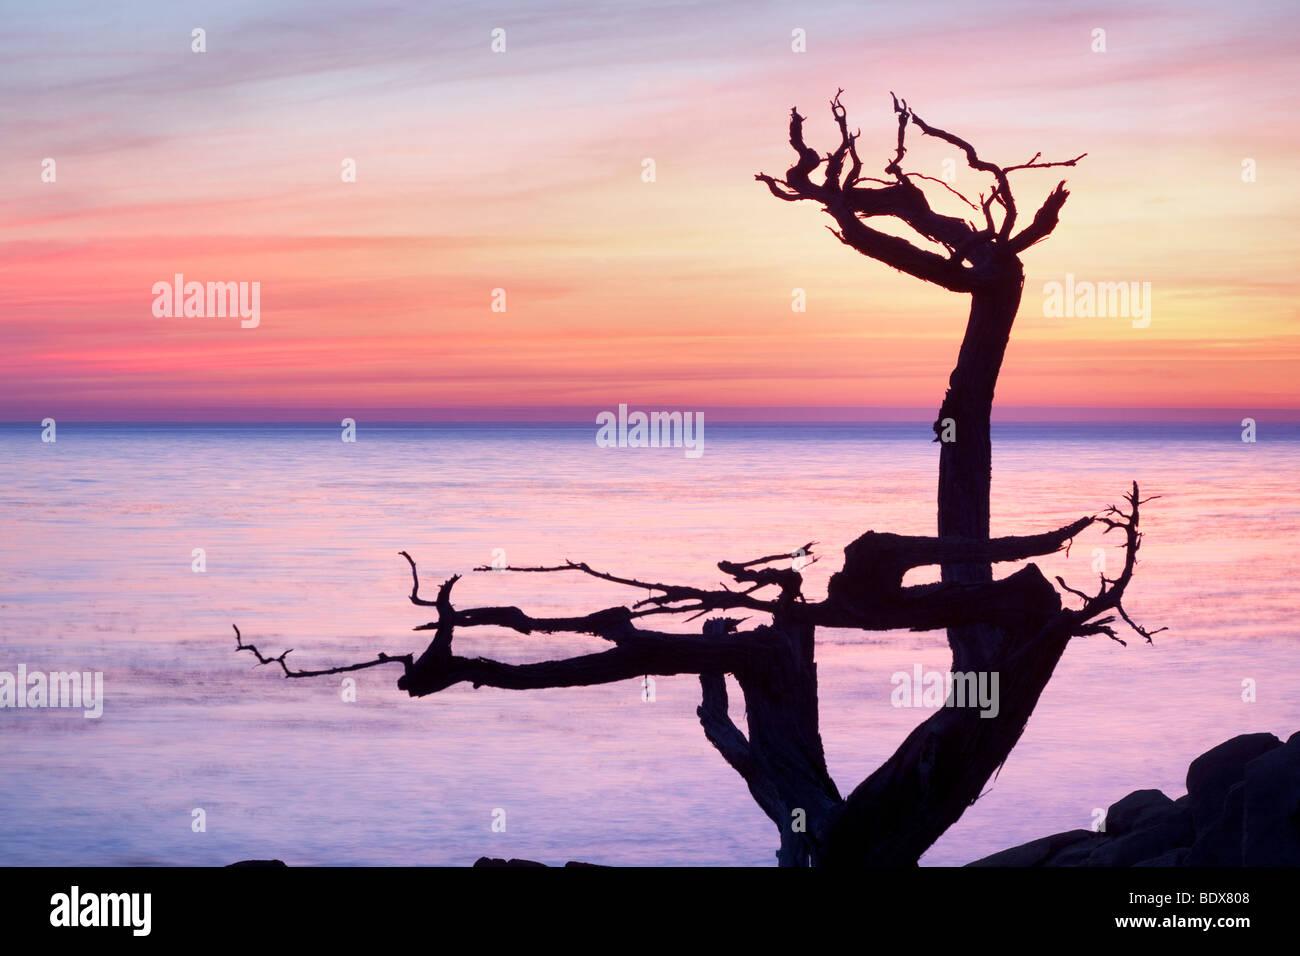 Silhouette Zypresse und Sonnenuntergang. 17 Mile Drive. Pebble Beach, Kalifornien Stockbild